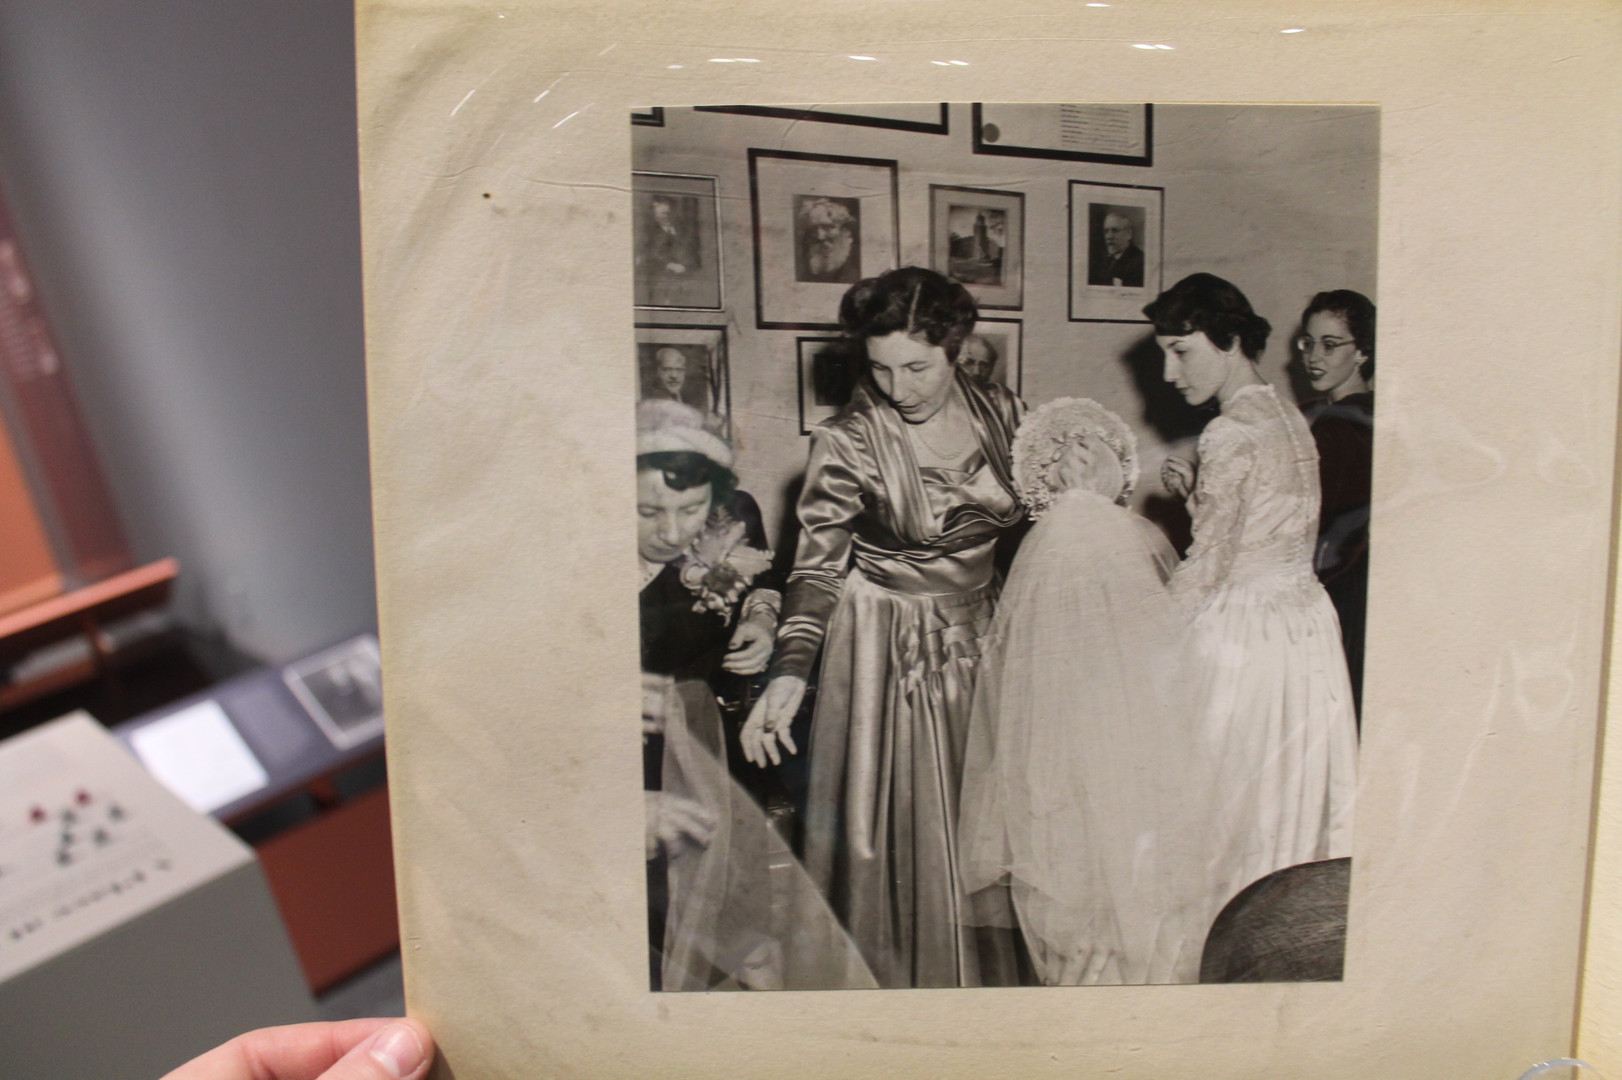 Wedding album, Gift of Efrem M. Potts. JMM 1995.192.11